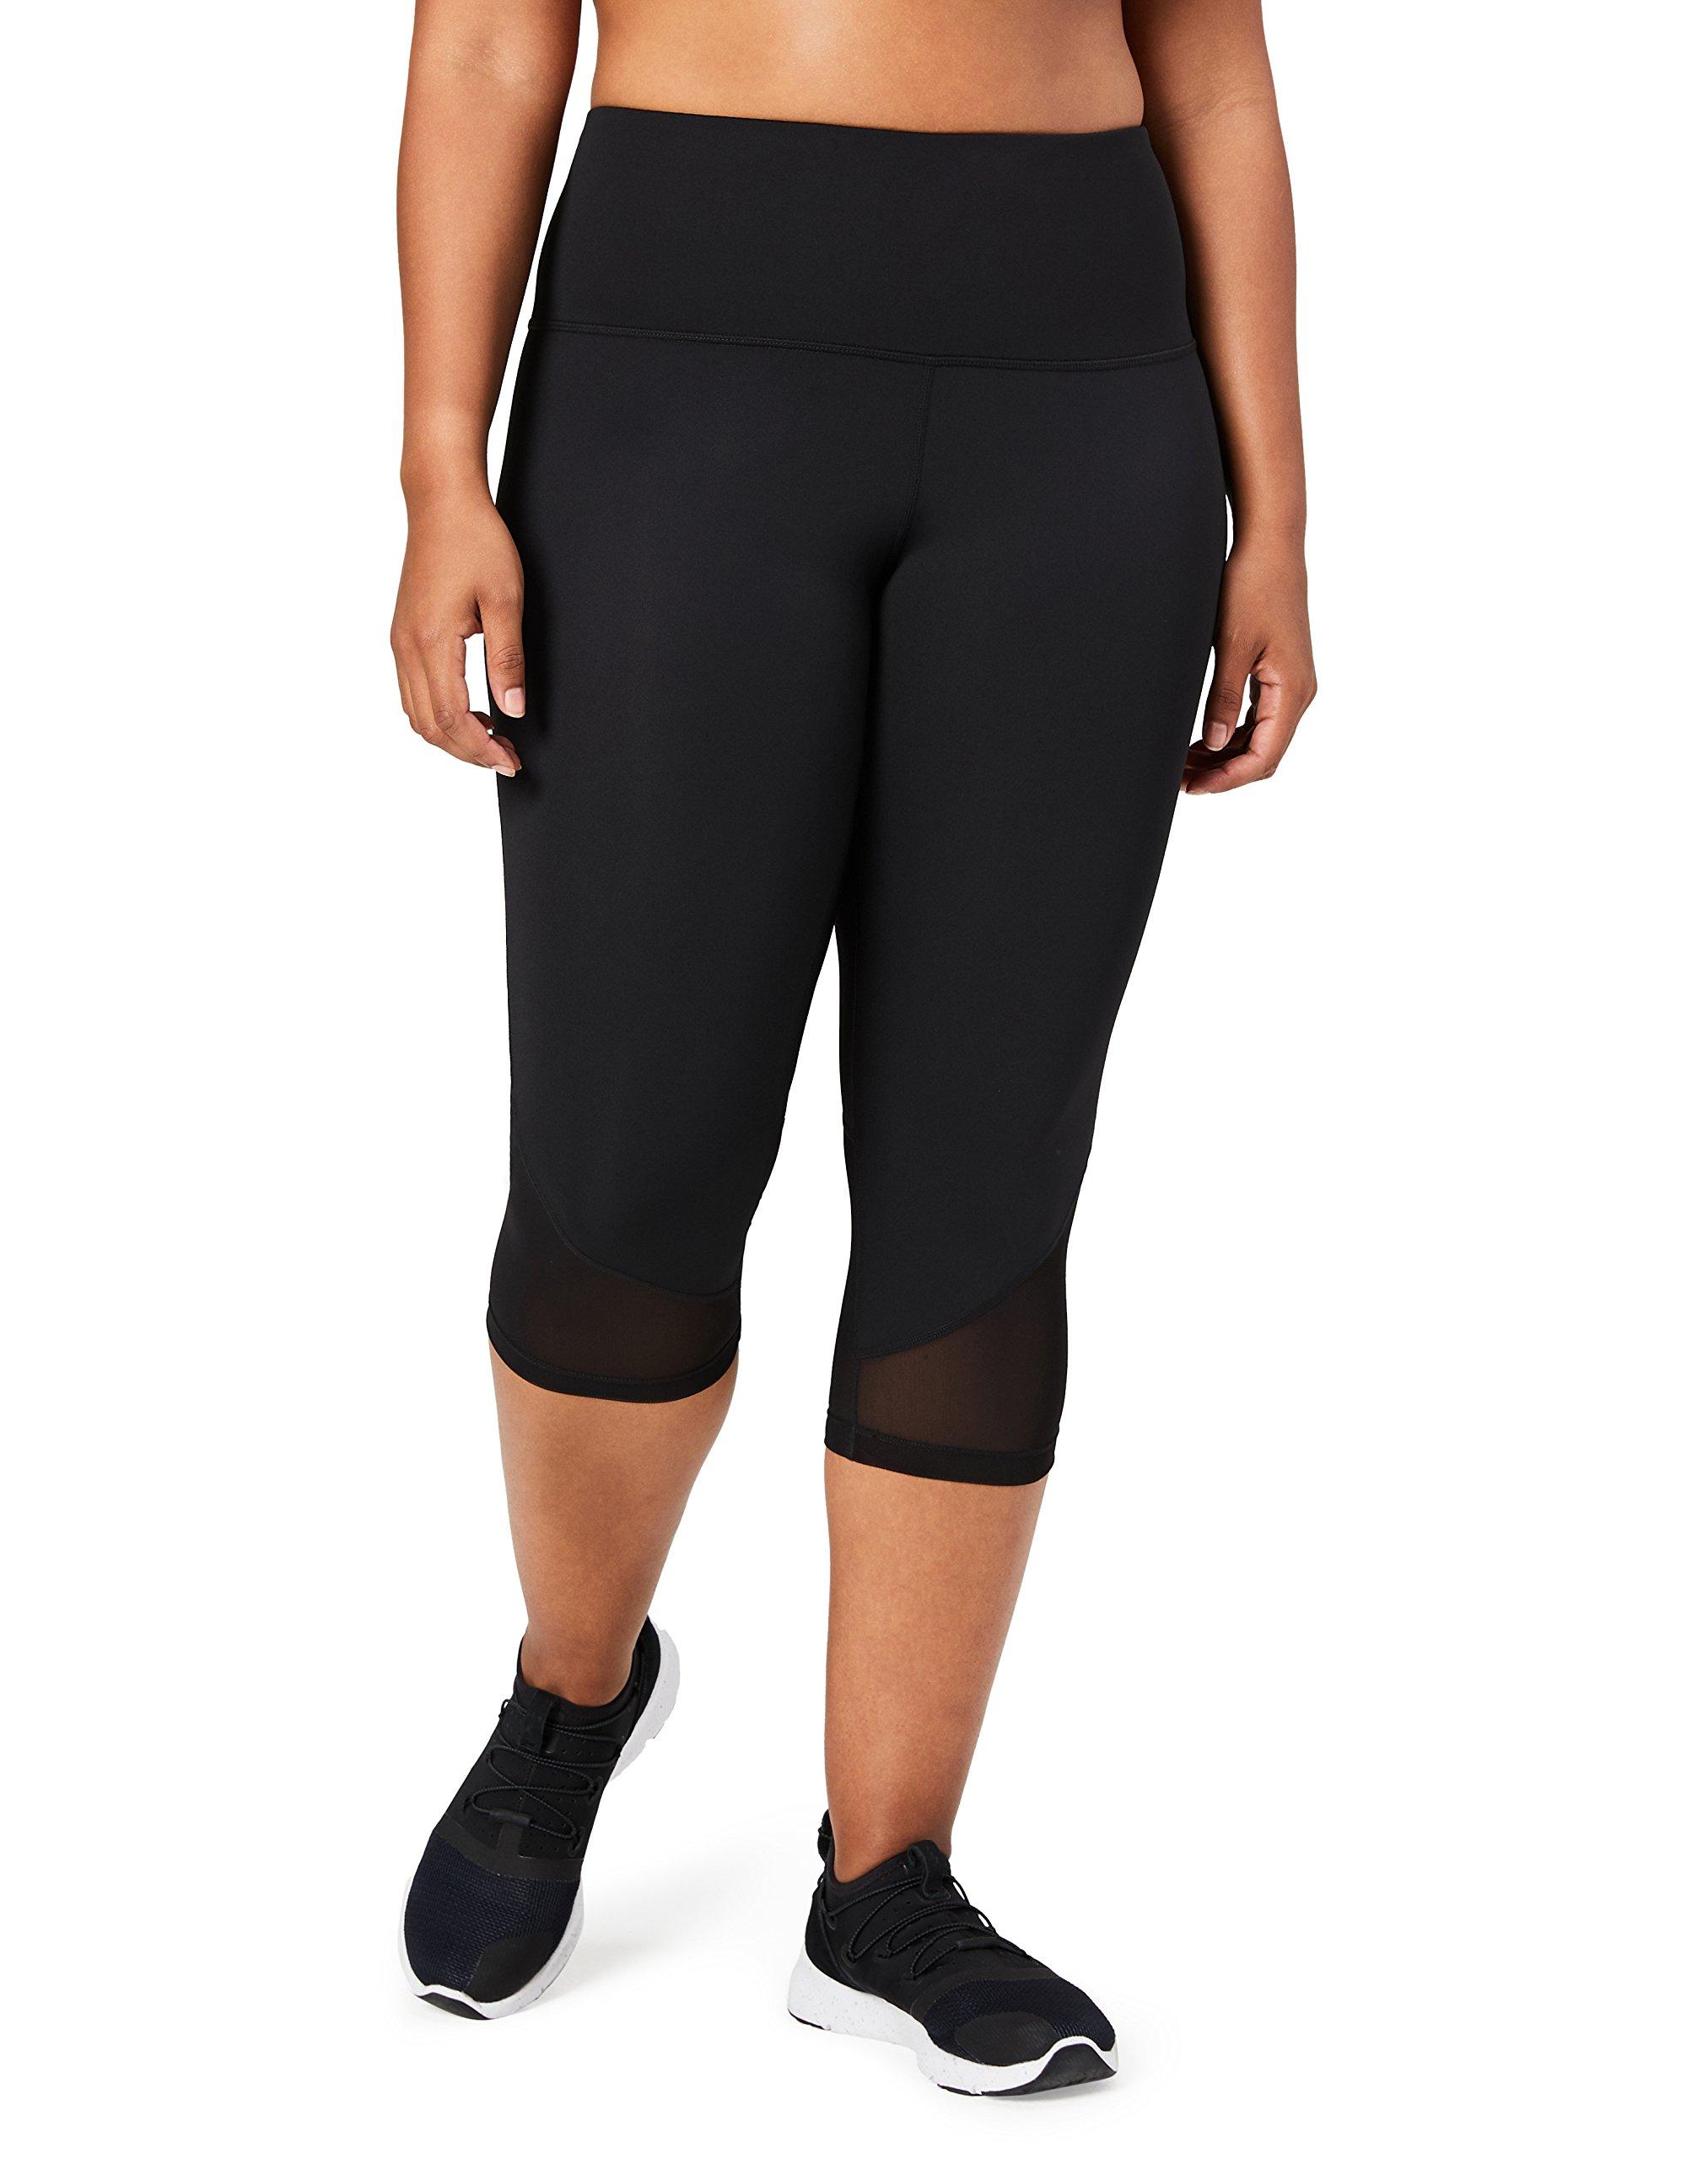 Core 10 Women's Plus Size Race Day High Waist Run Mesh Capri Legging - 19'', Black, 3X (22W-24W)